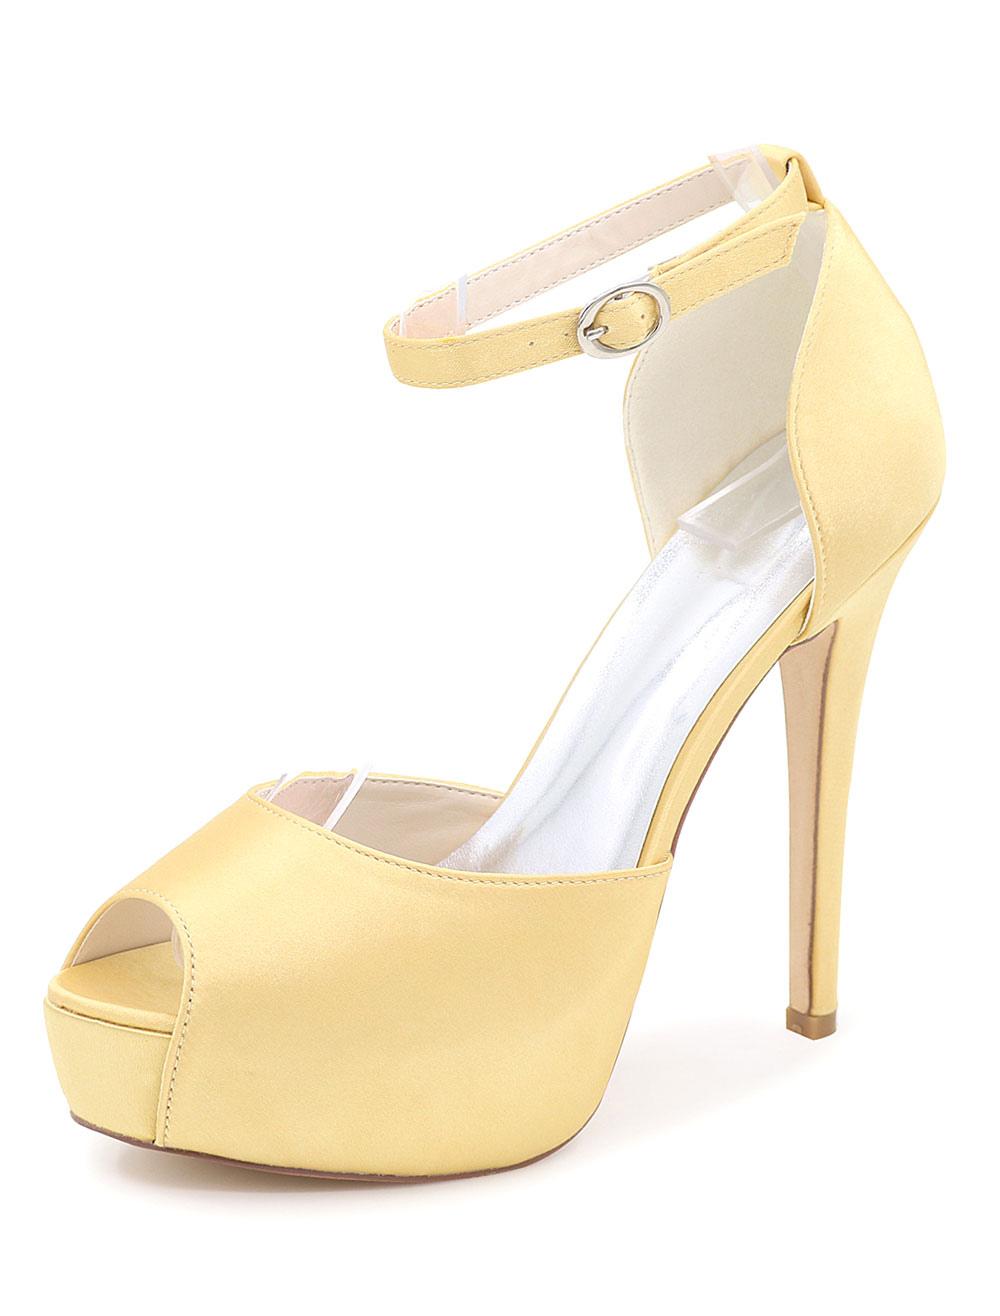 Peep Toe Satin Evening and Bridal Sandals